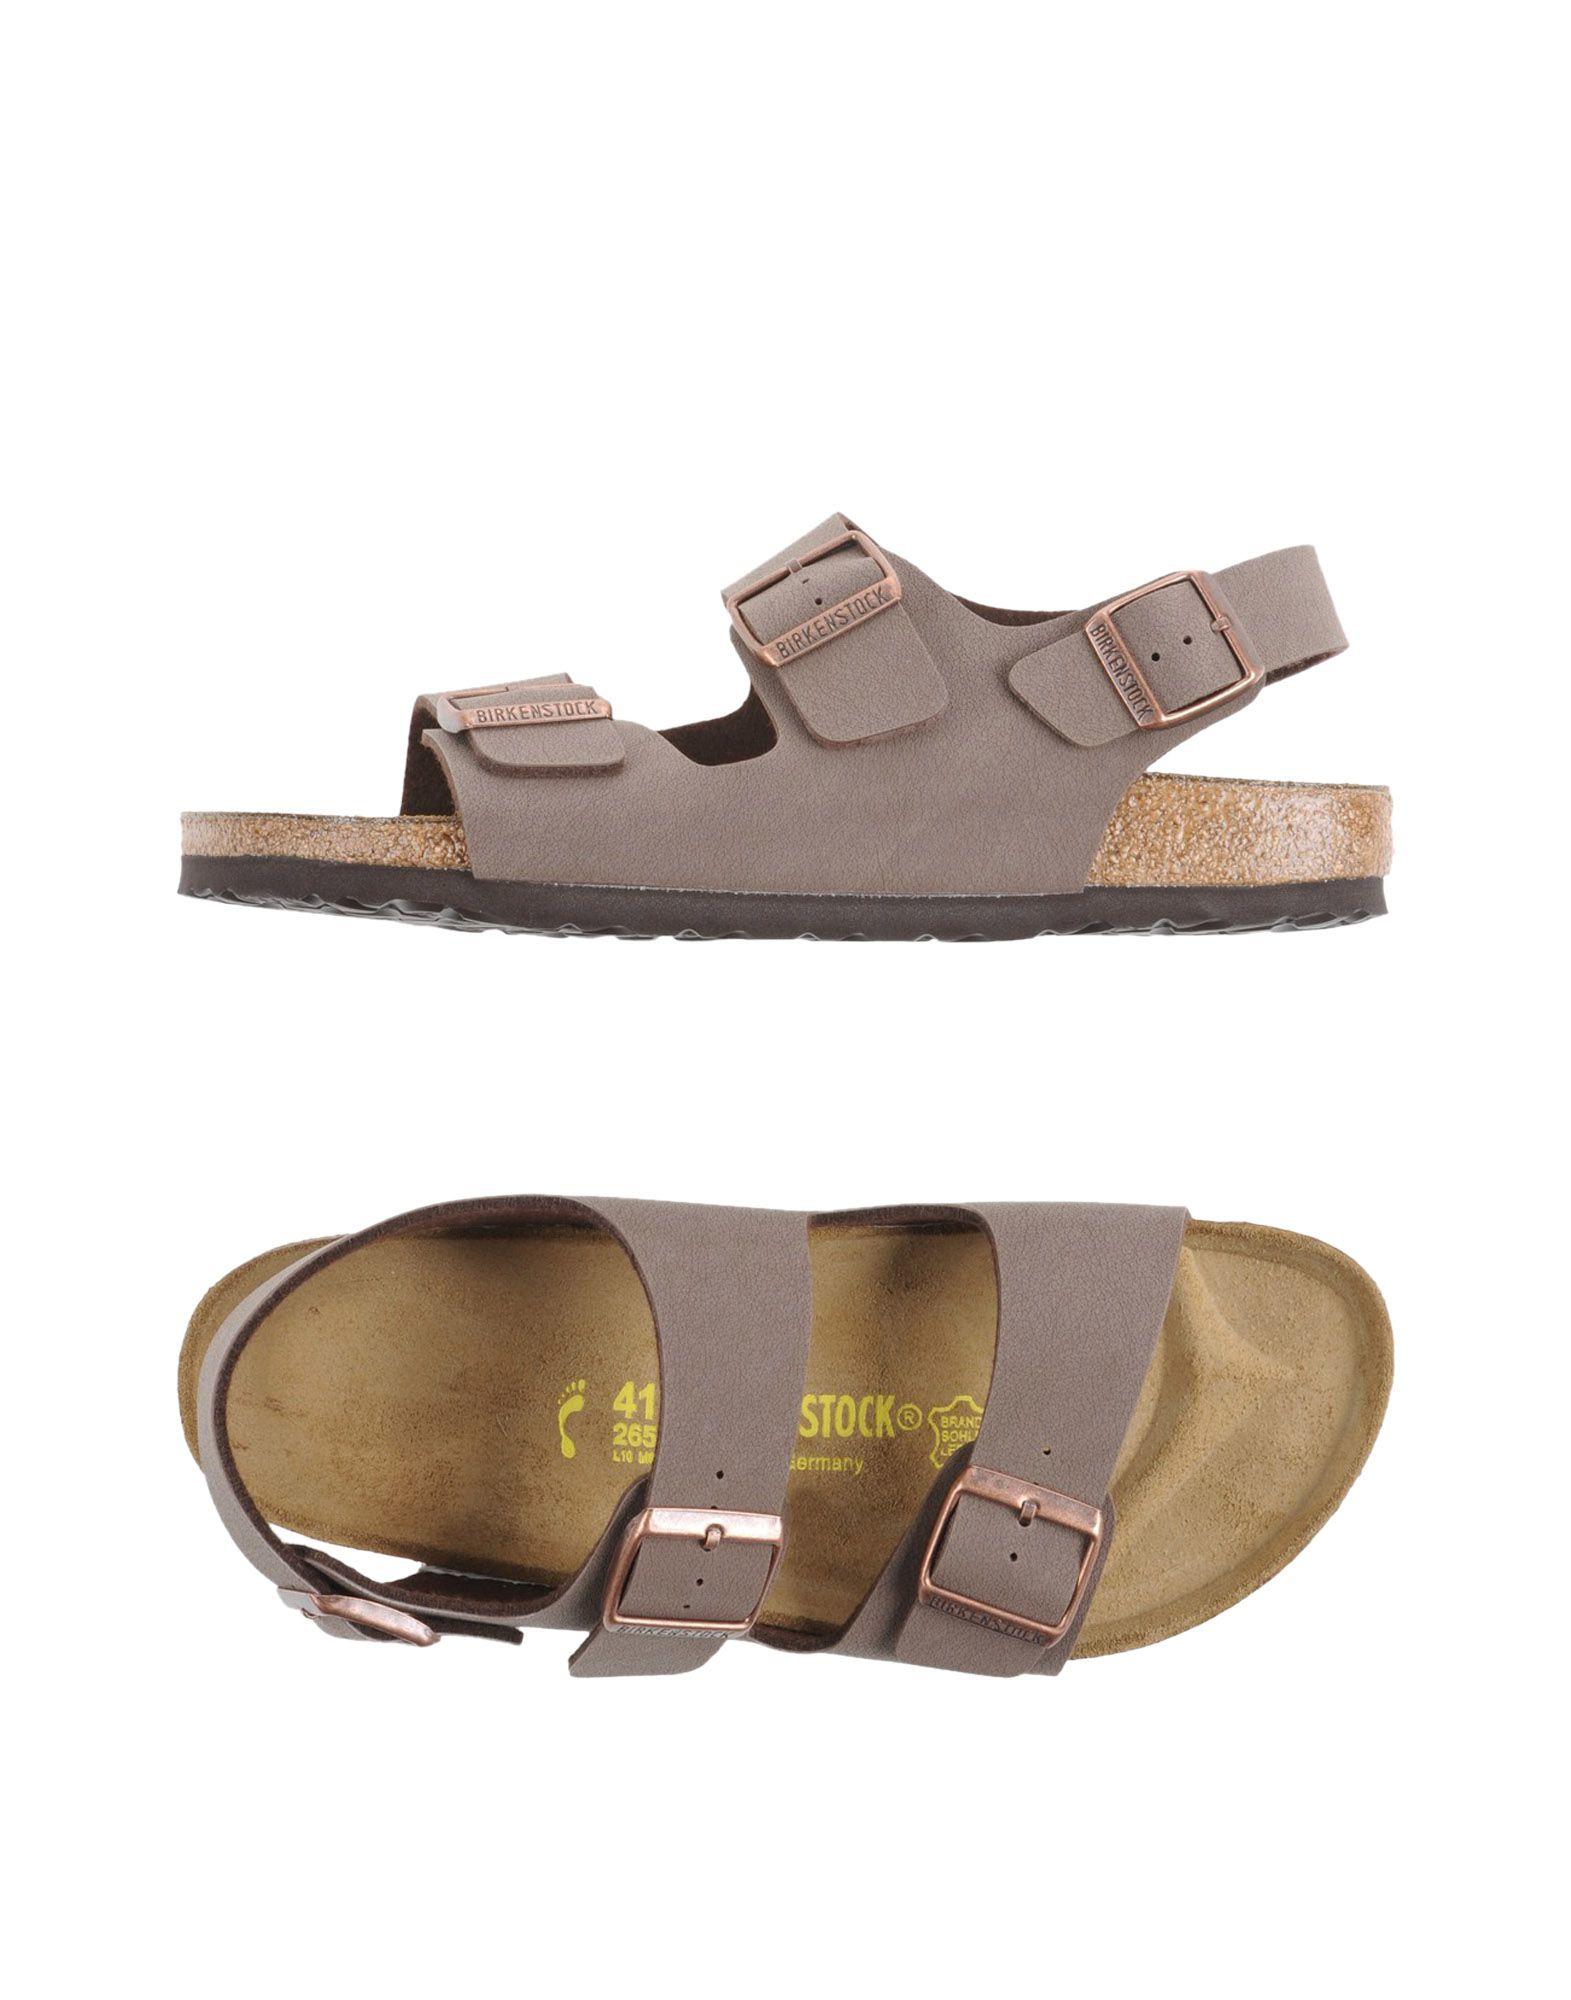 9e7372519830 Lyst - Birkenstock Sandals in Brown for Men